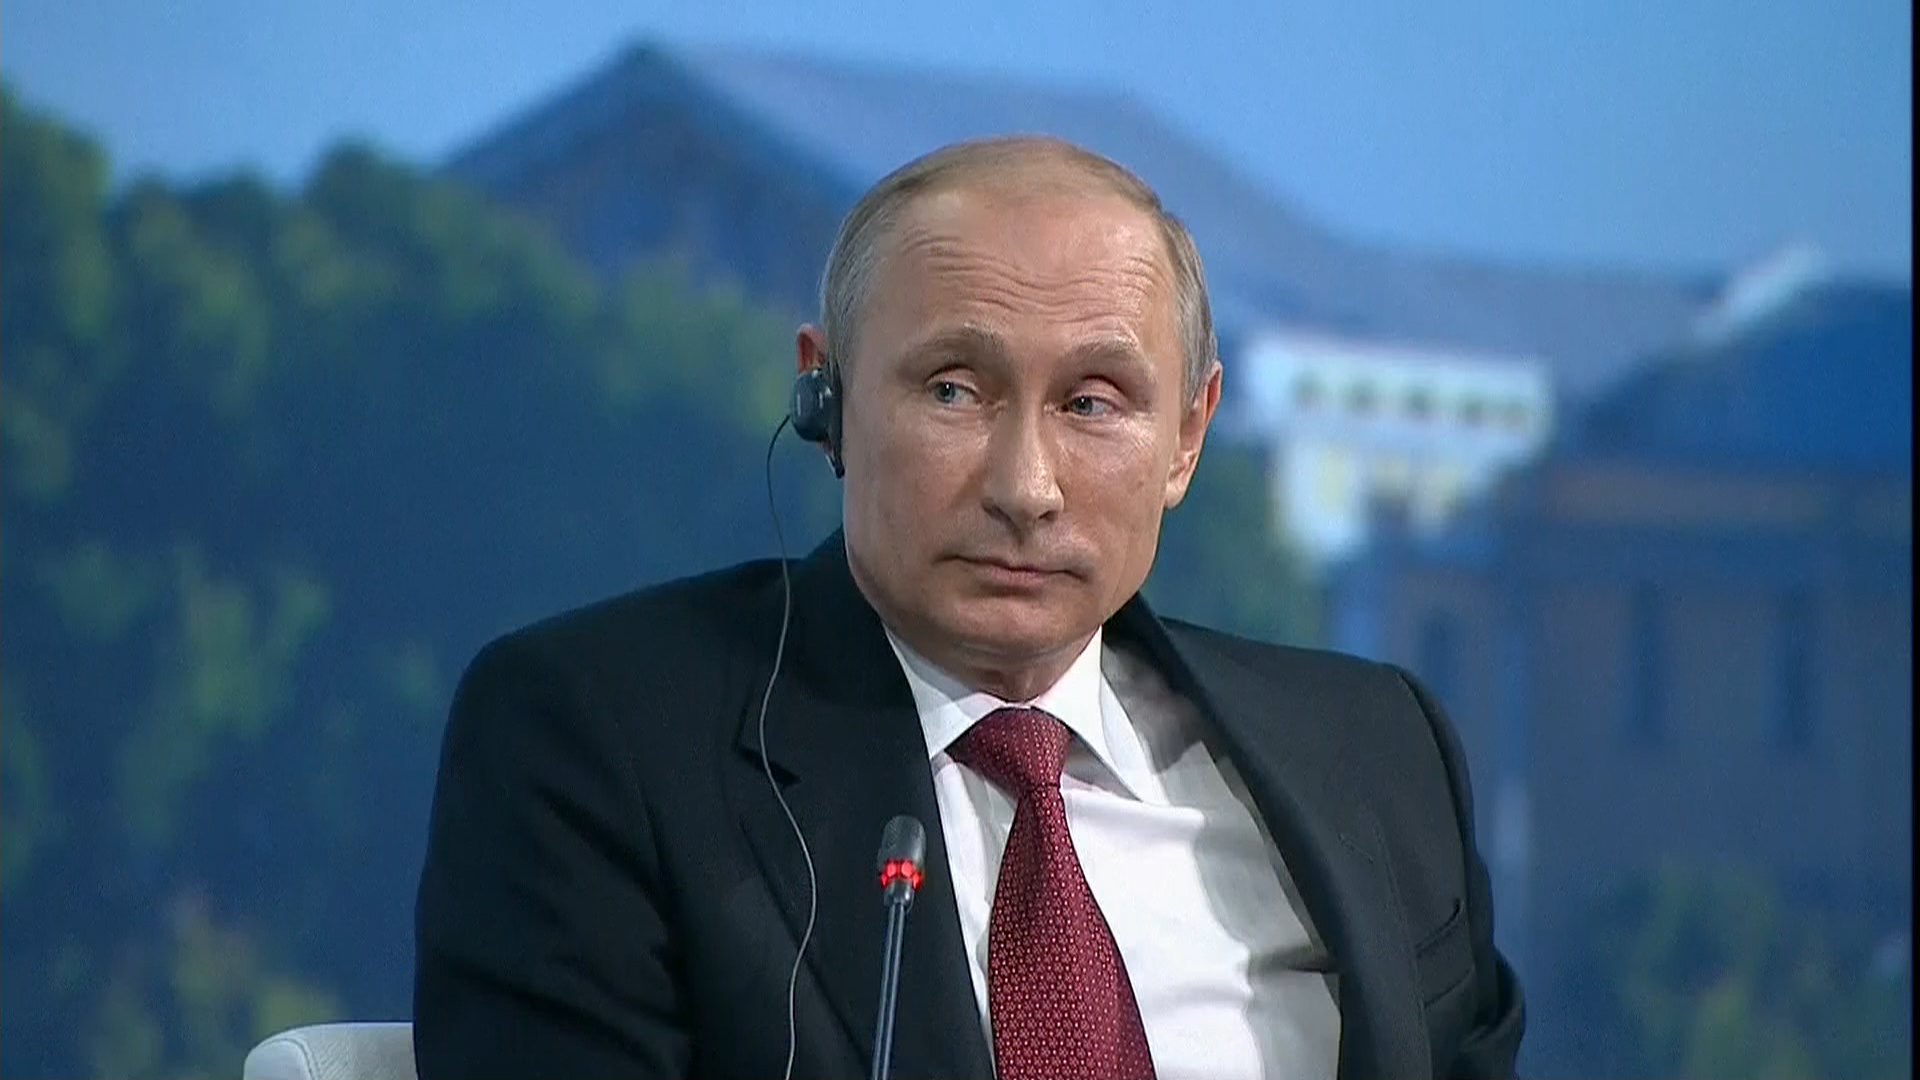 Putin: Sanctions hurt Russian economy